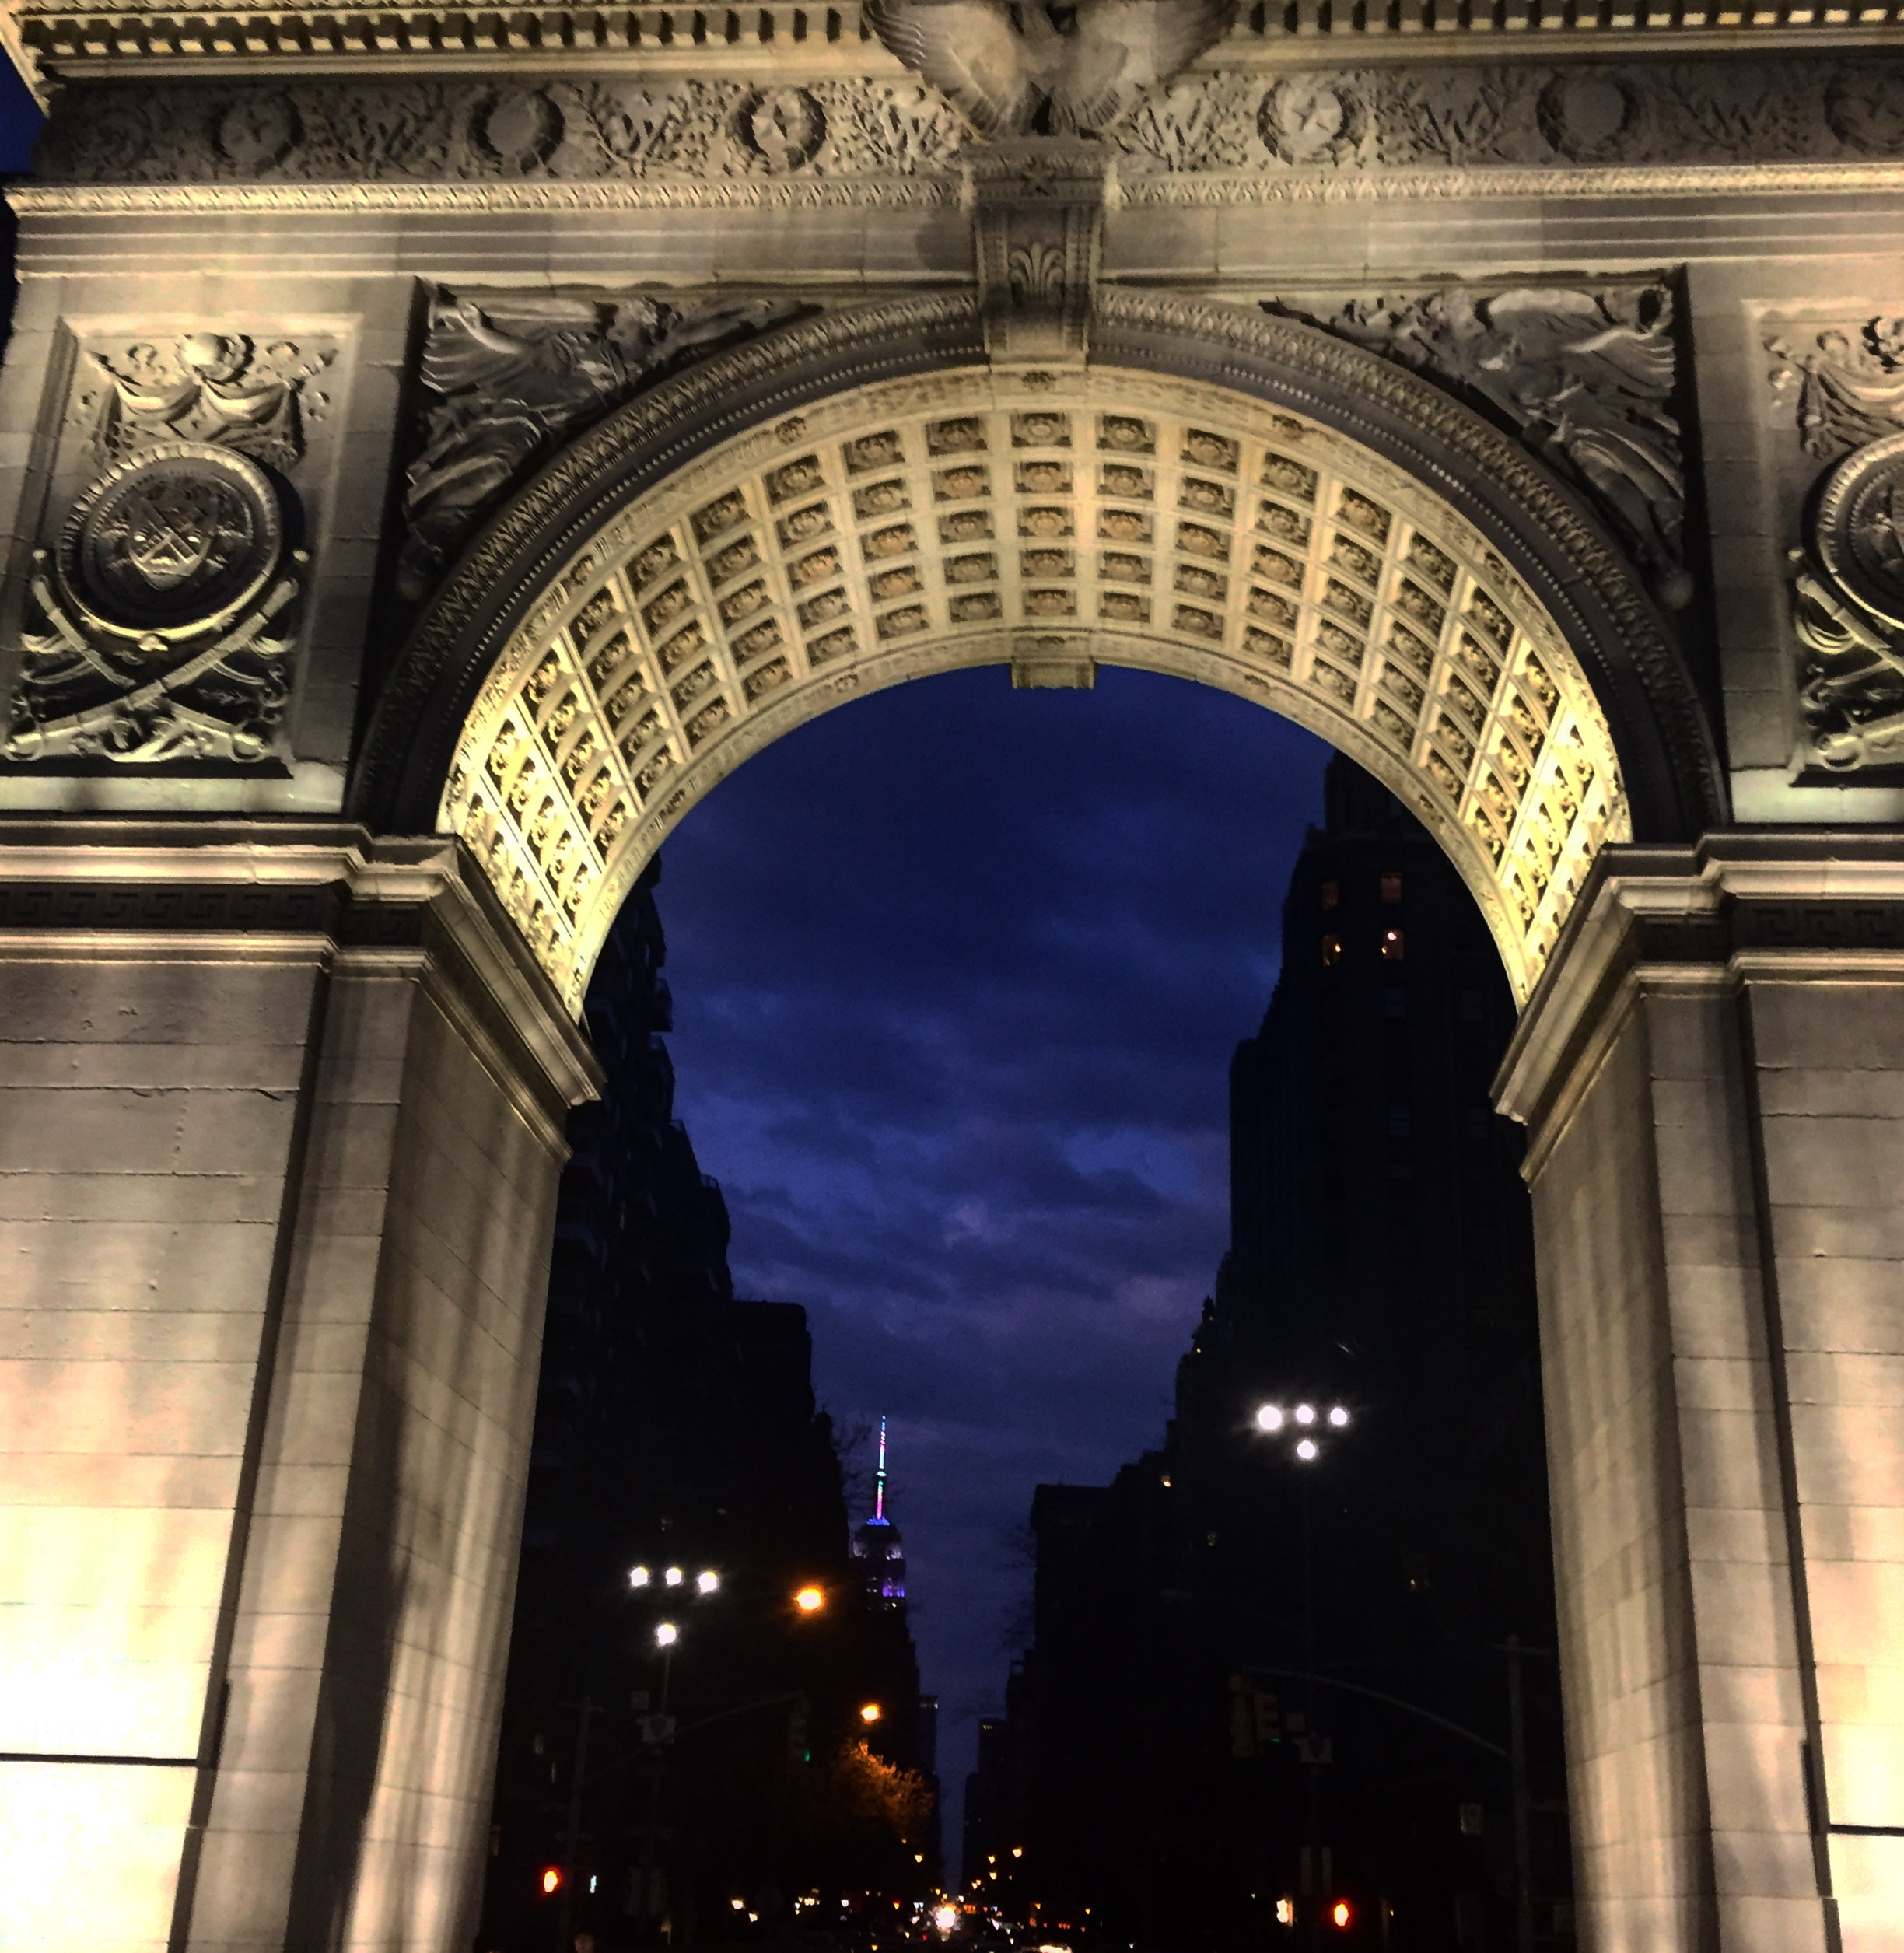 Wanderlusting: The Washington Arch